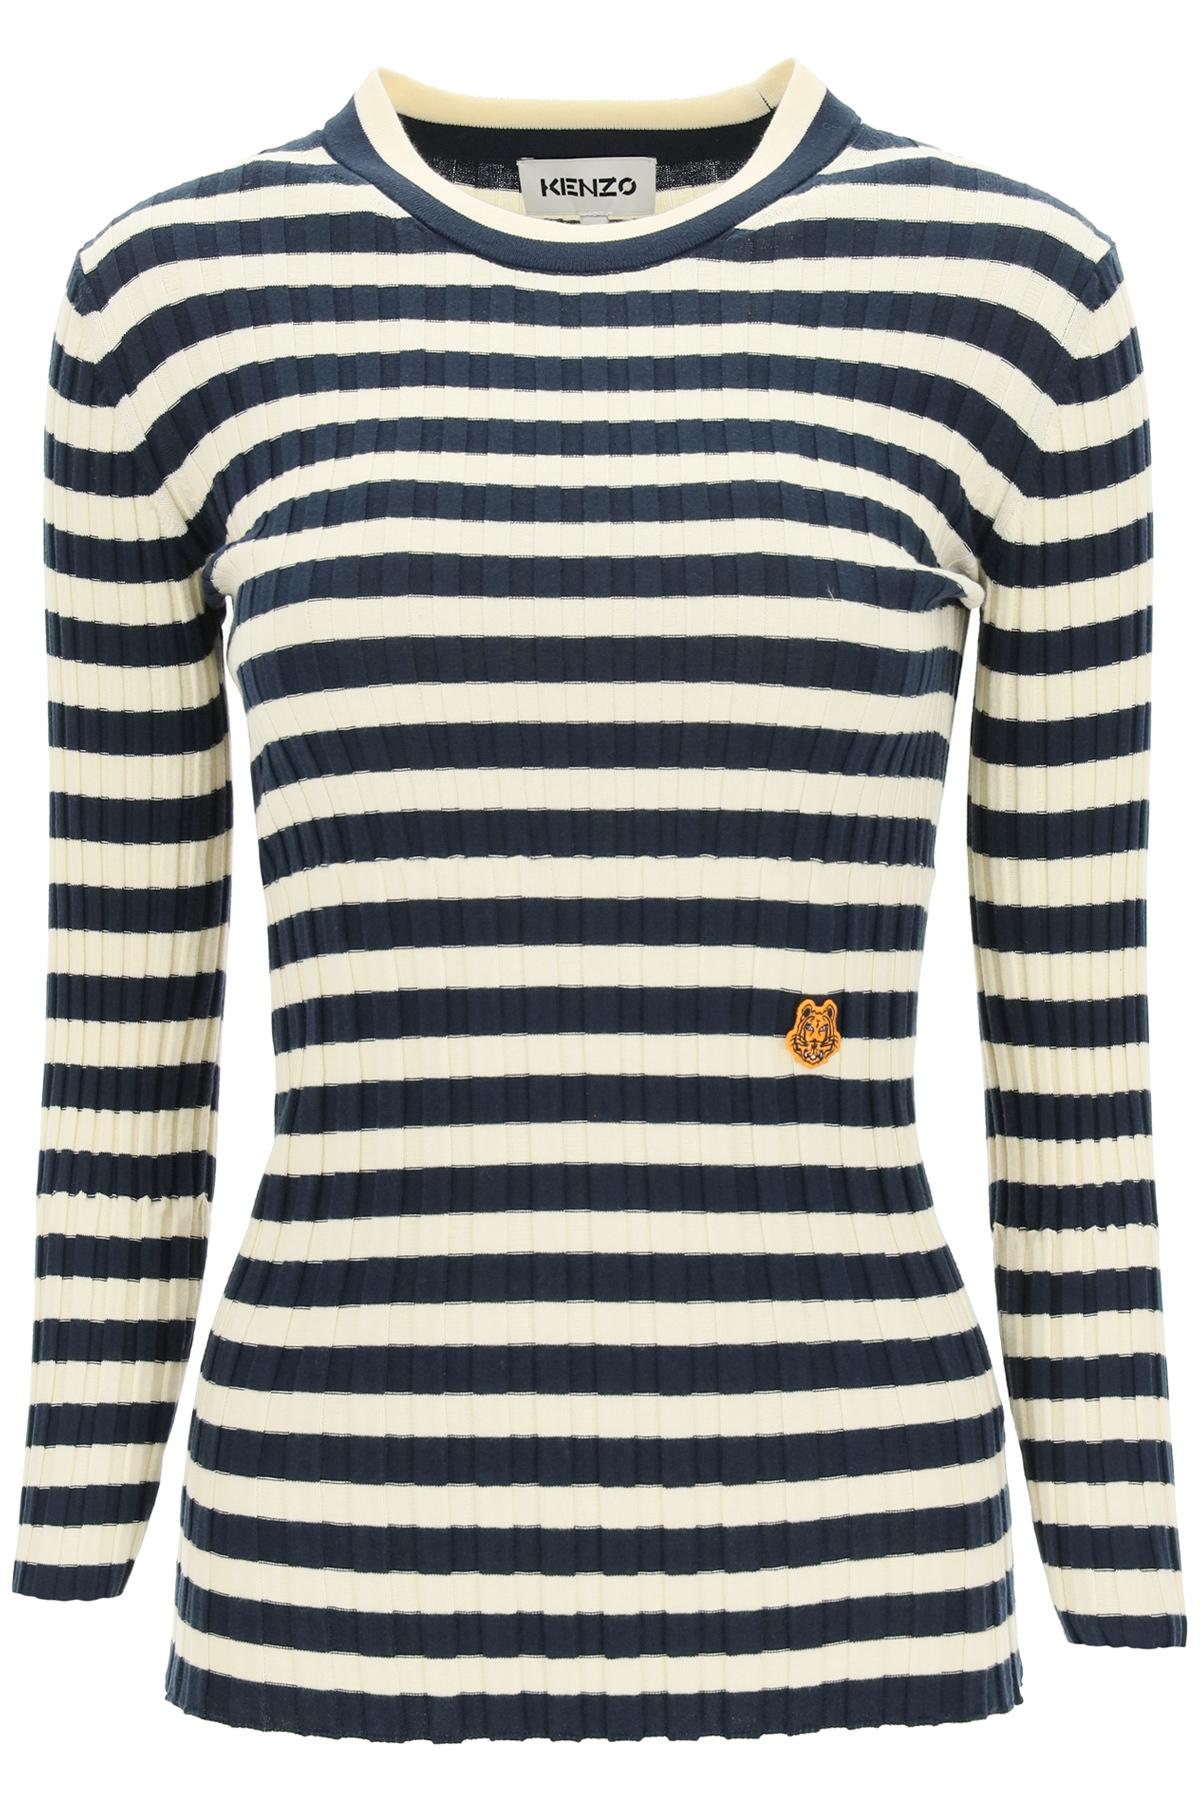 Kenzo maglia a righe patch tiger crest